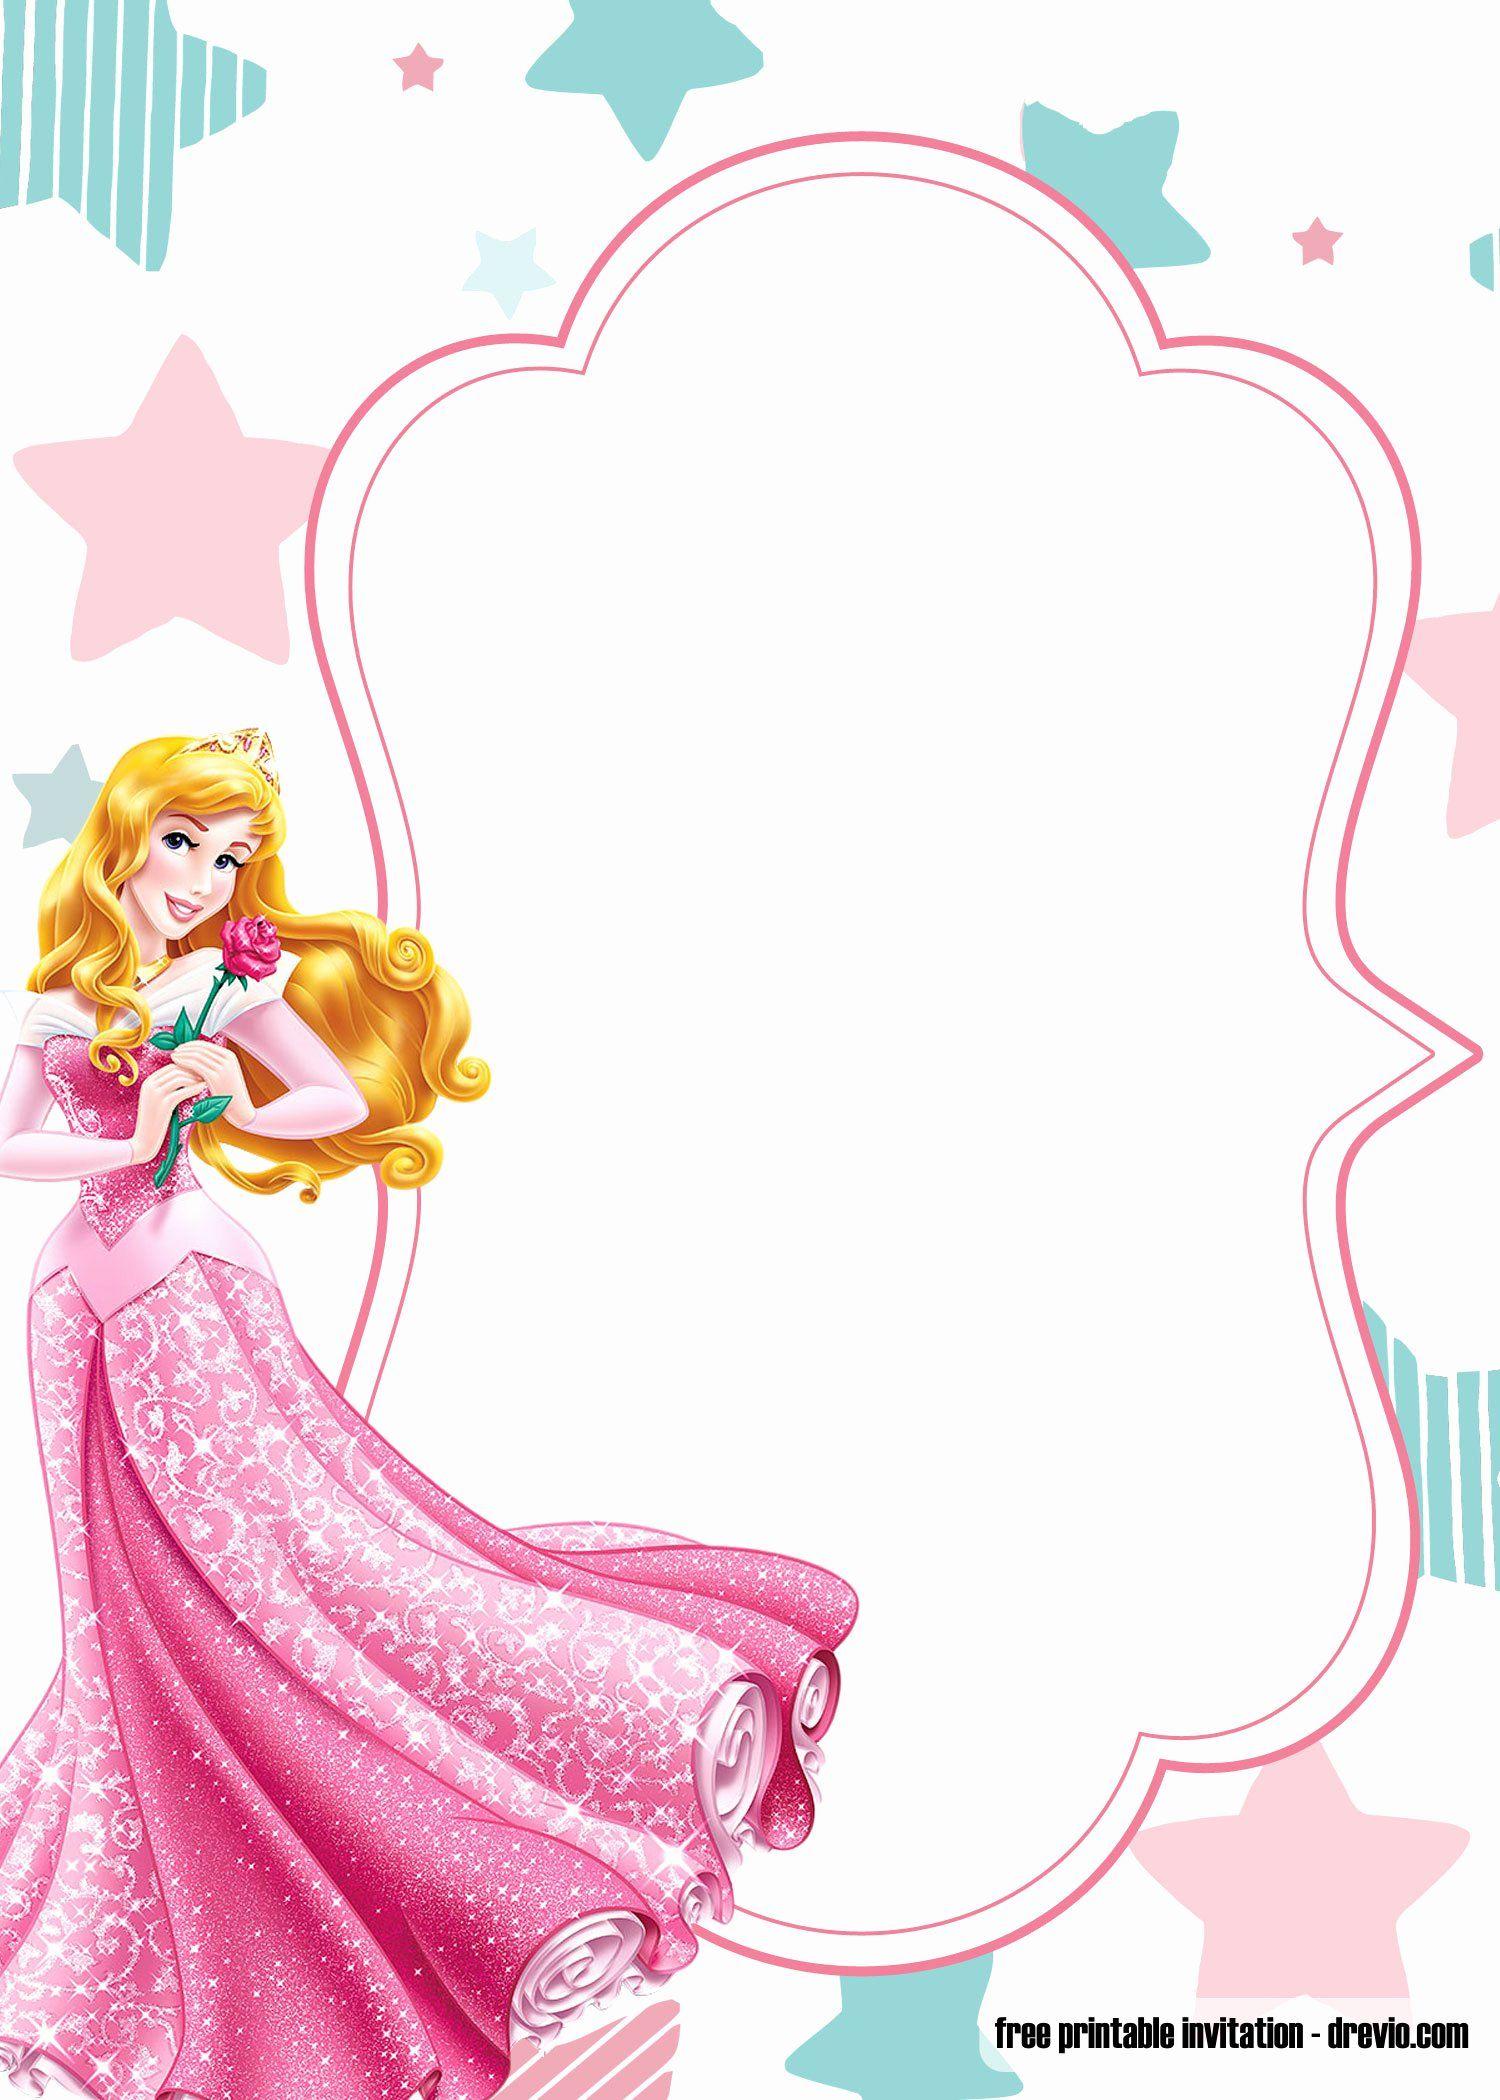 Disney Princess Invitation Template Fresh Free Printable Princess Birthday Invit Disney Princess Invitations Princess Birthday Invitations Princess Invitations